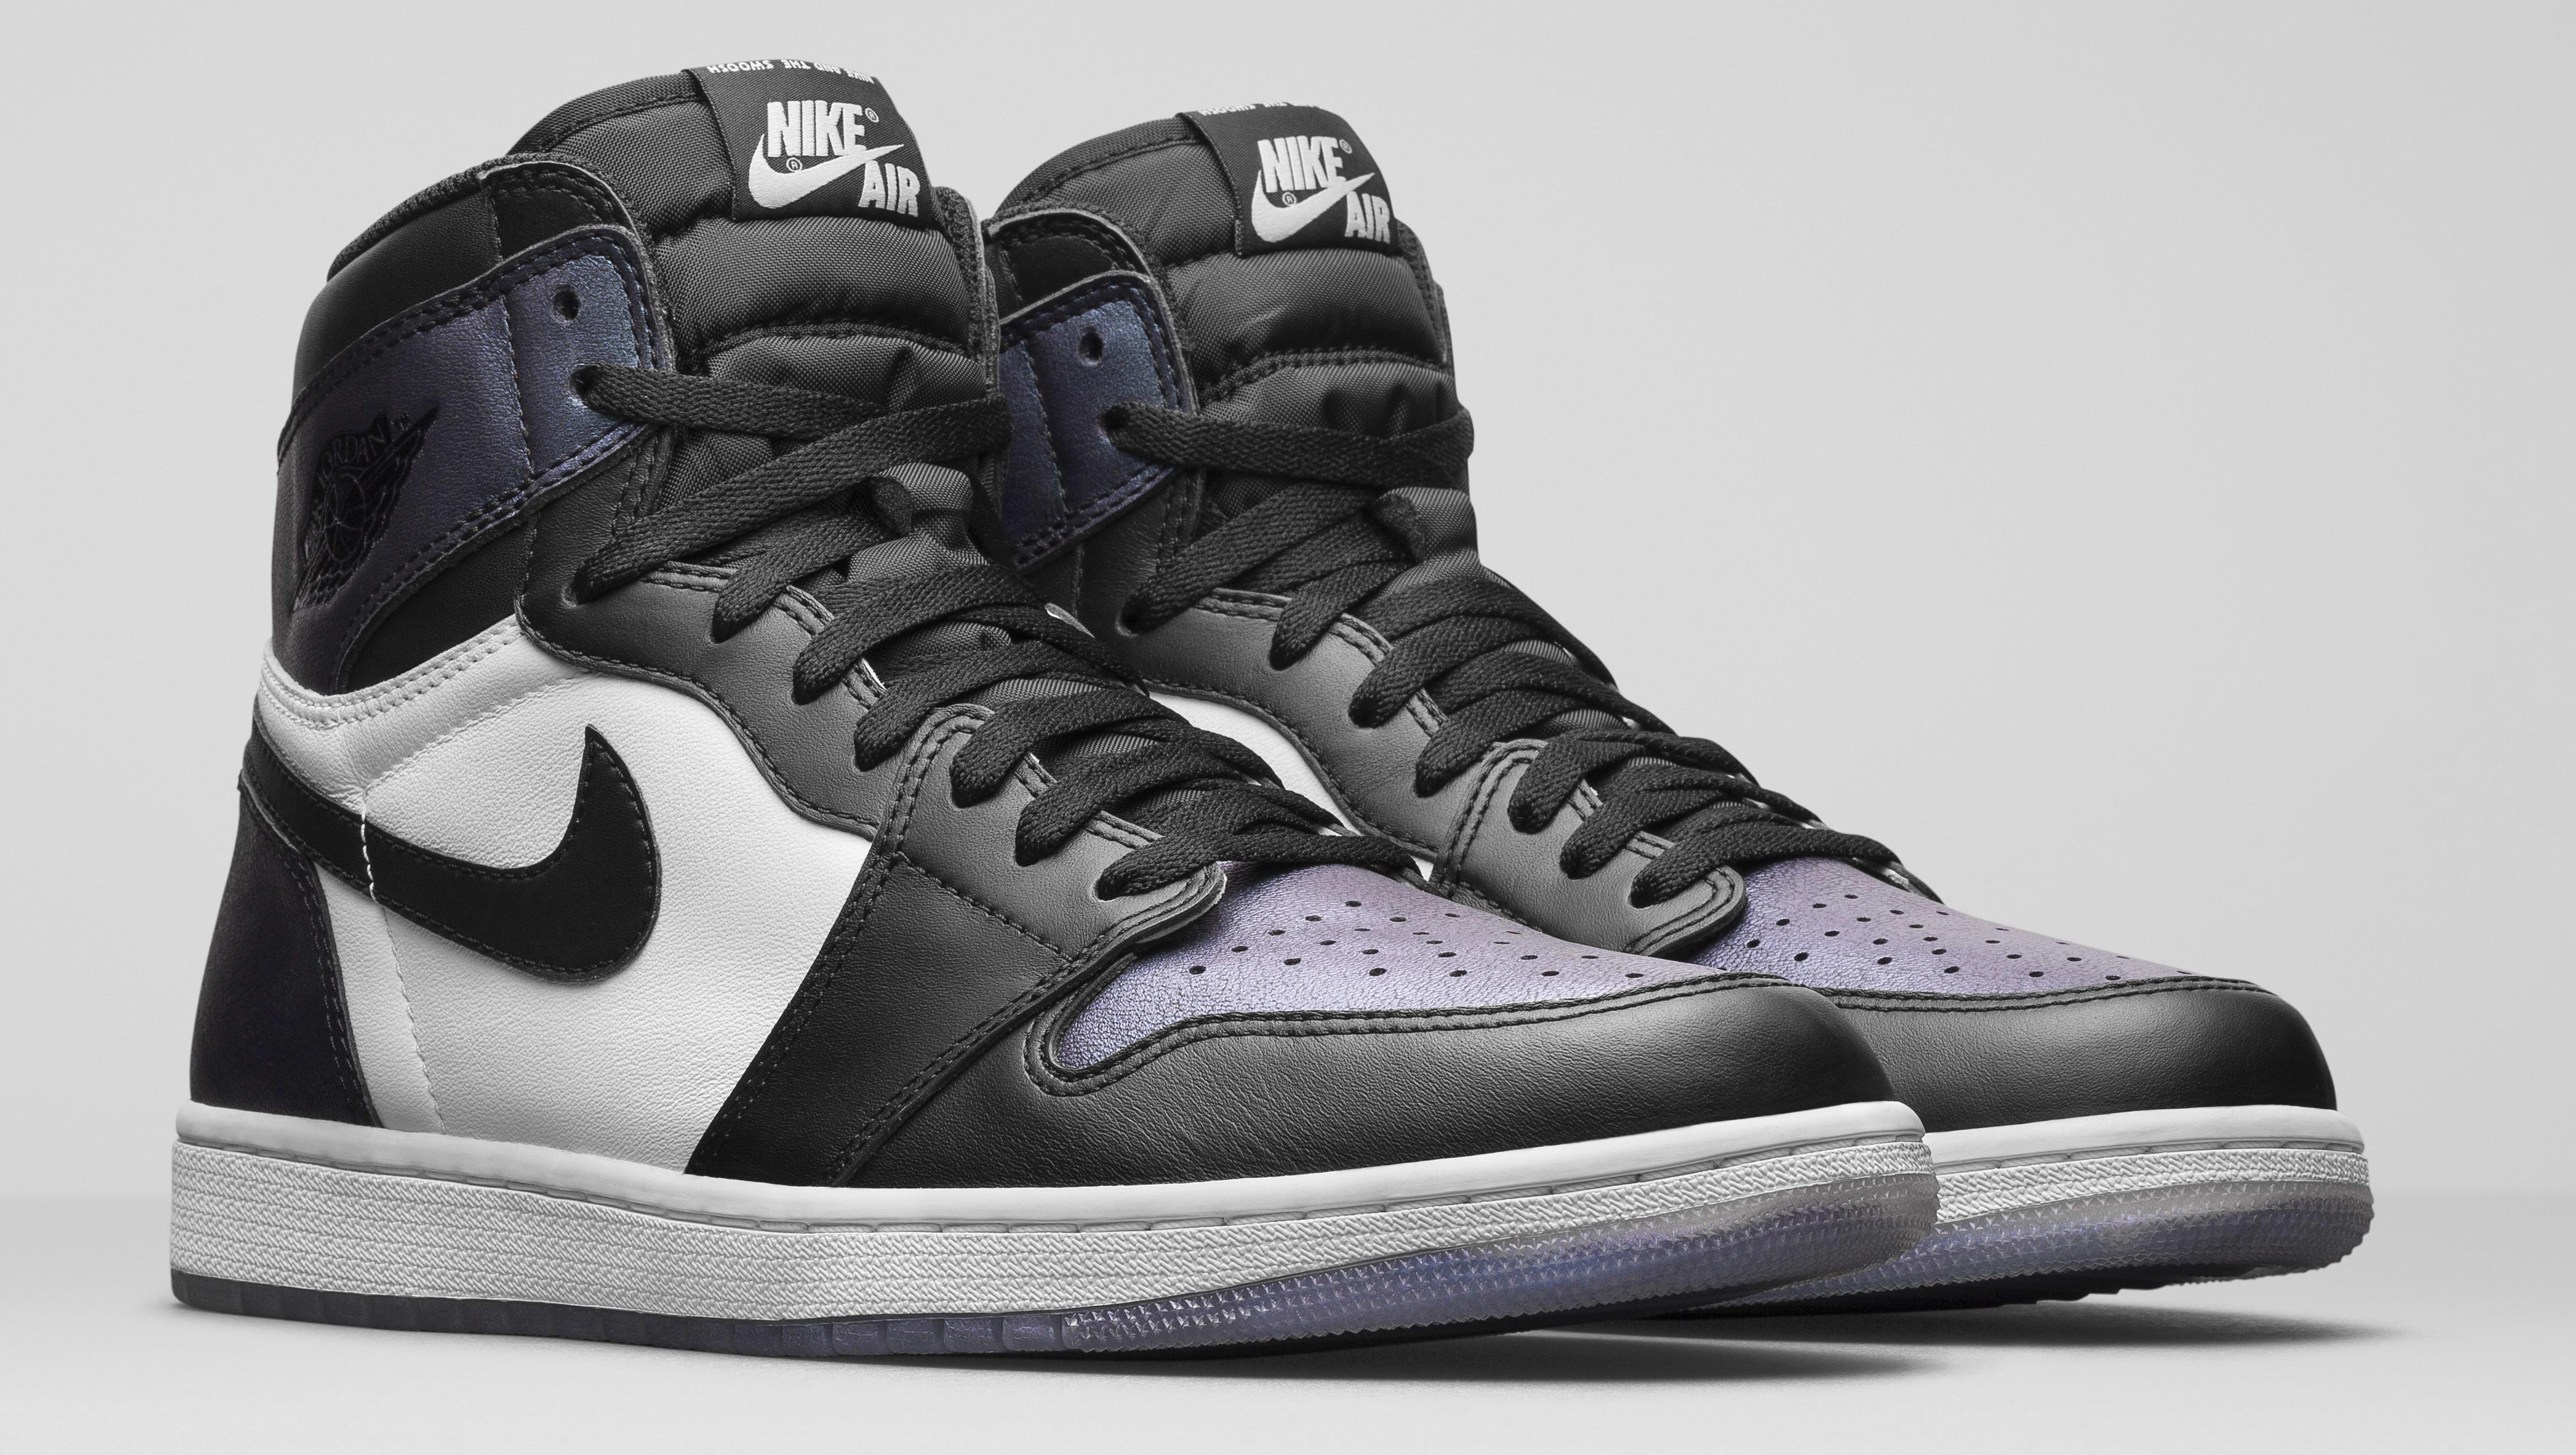 best website 0a981 2609f Image via Nike Air Jordan 1